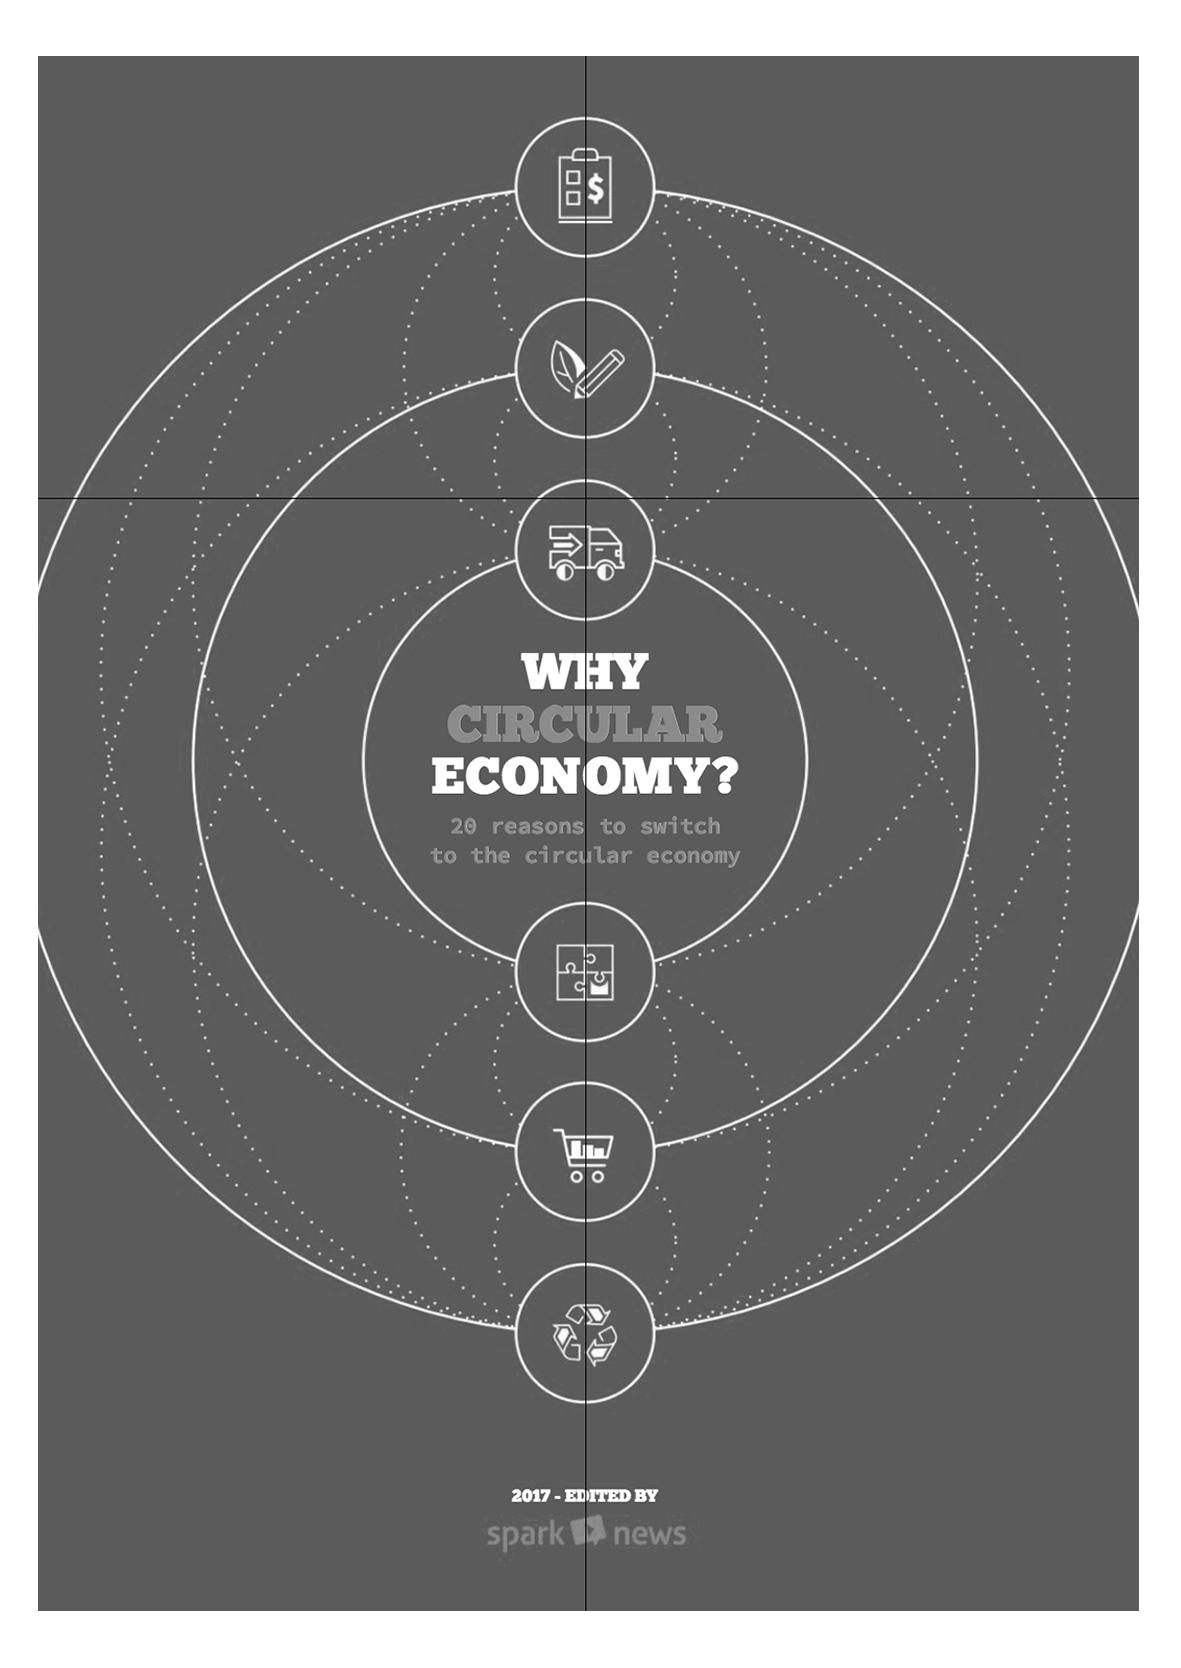 Why circular economy?